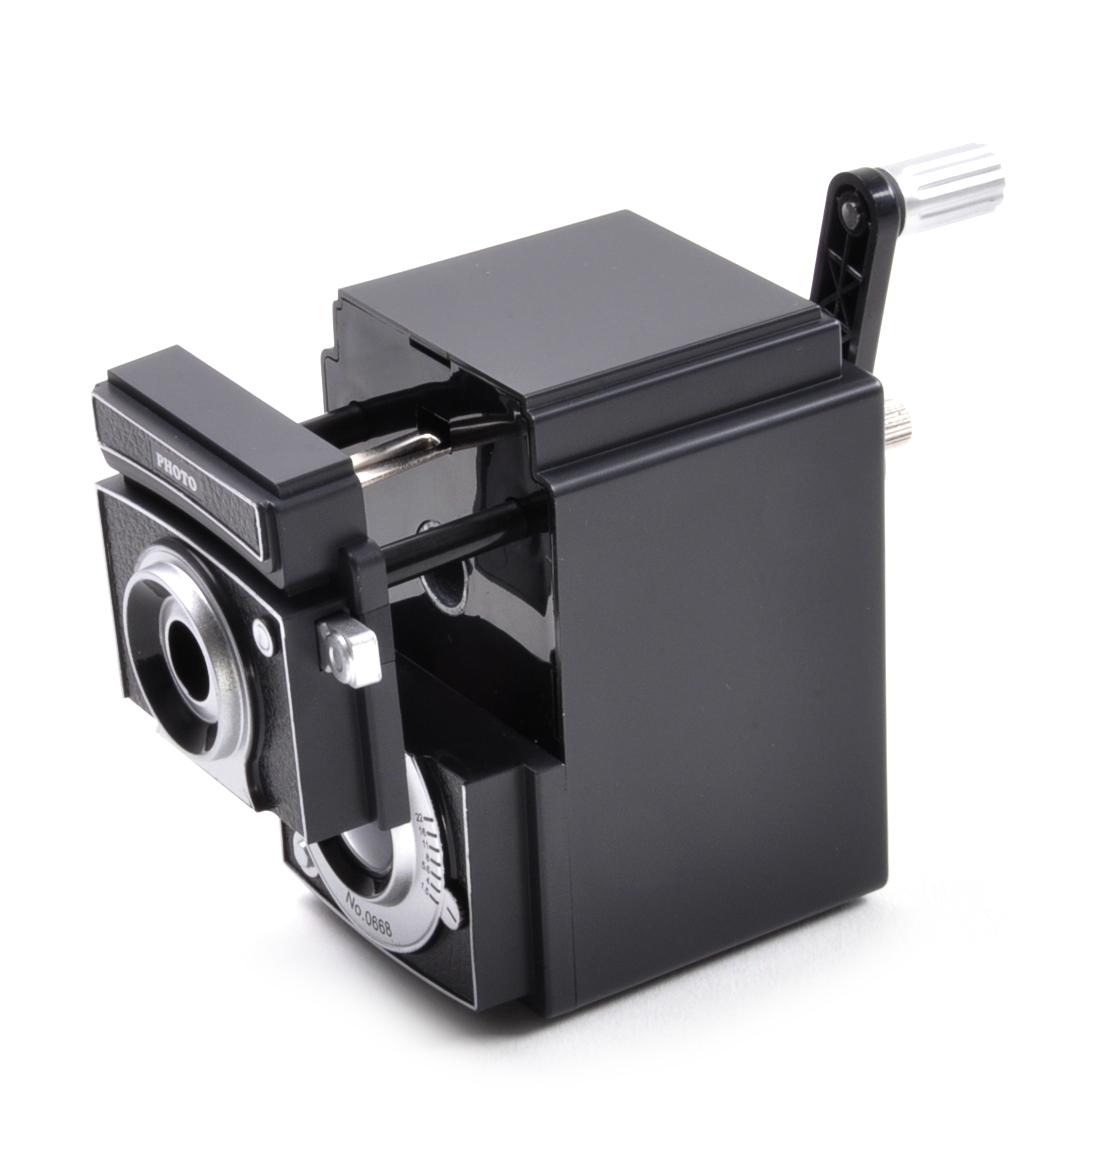 Retro Rolleiflex Camera Pencil Sharpener | Pink Cat Shop